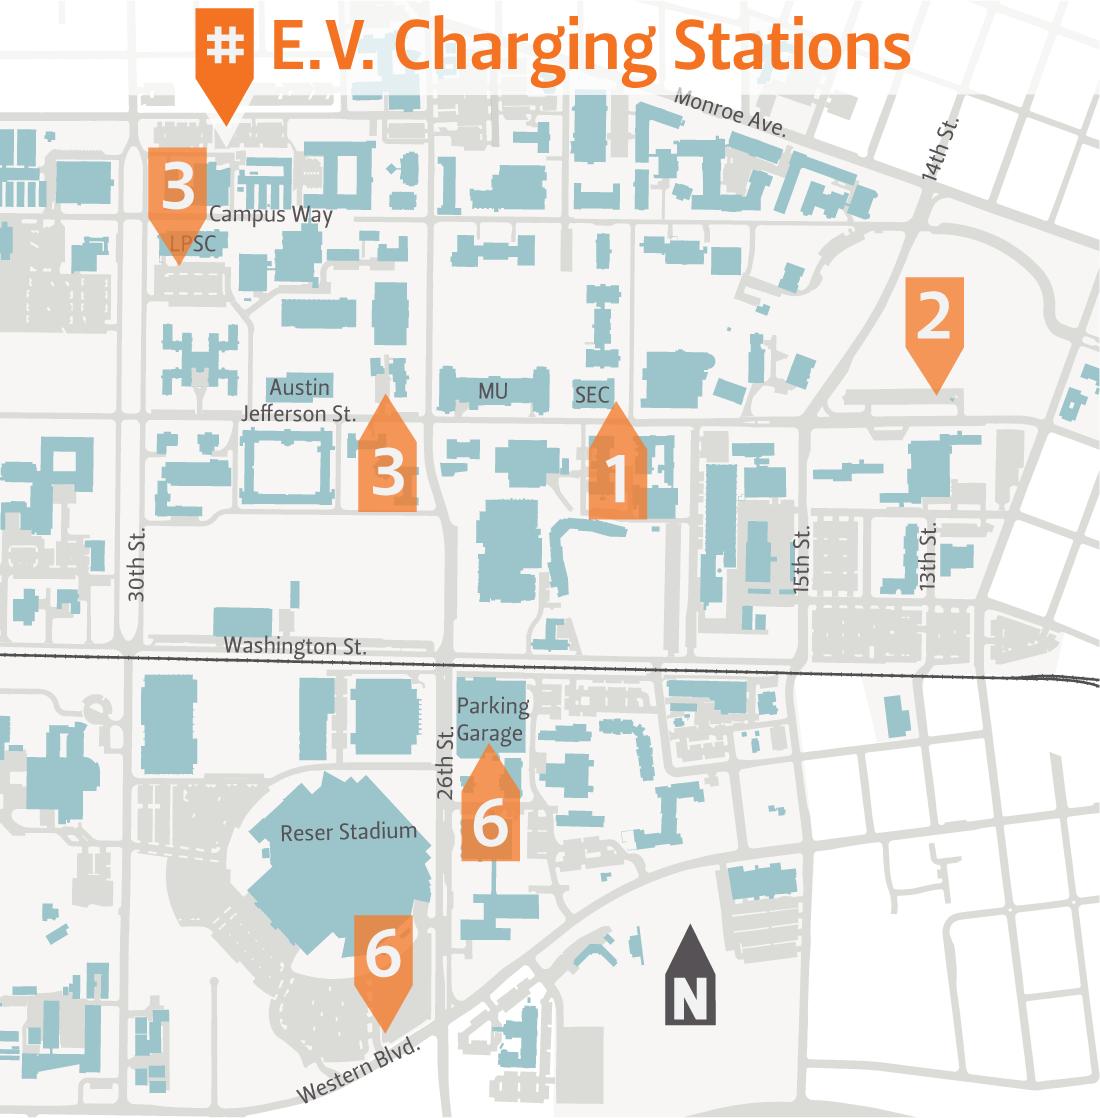 EV Charging Finance And Administration Oregon State University - Us map of ev charging stations